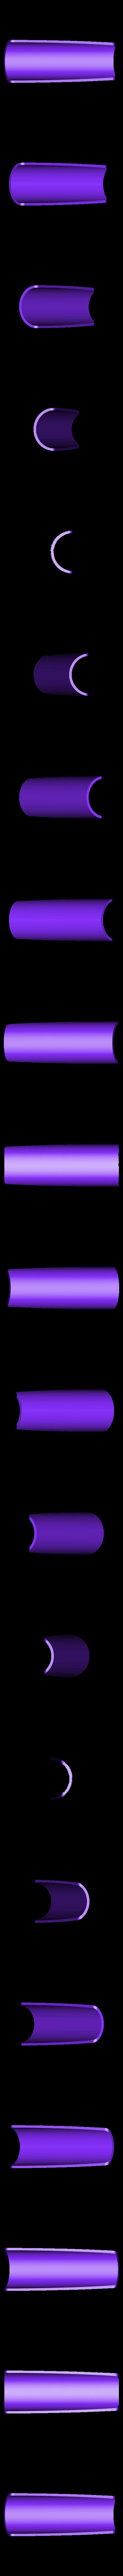 Partchausse.stl Download free STL file shoehorn • 3D print template, mk25